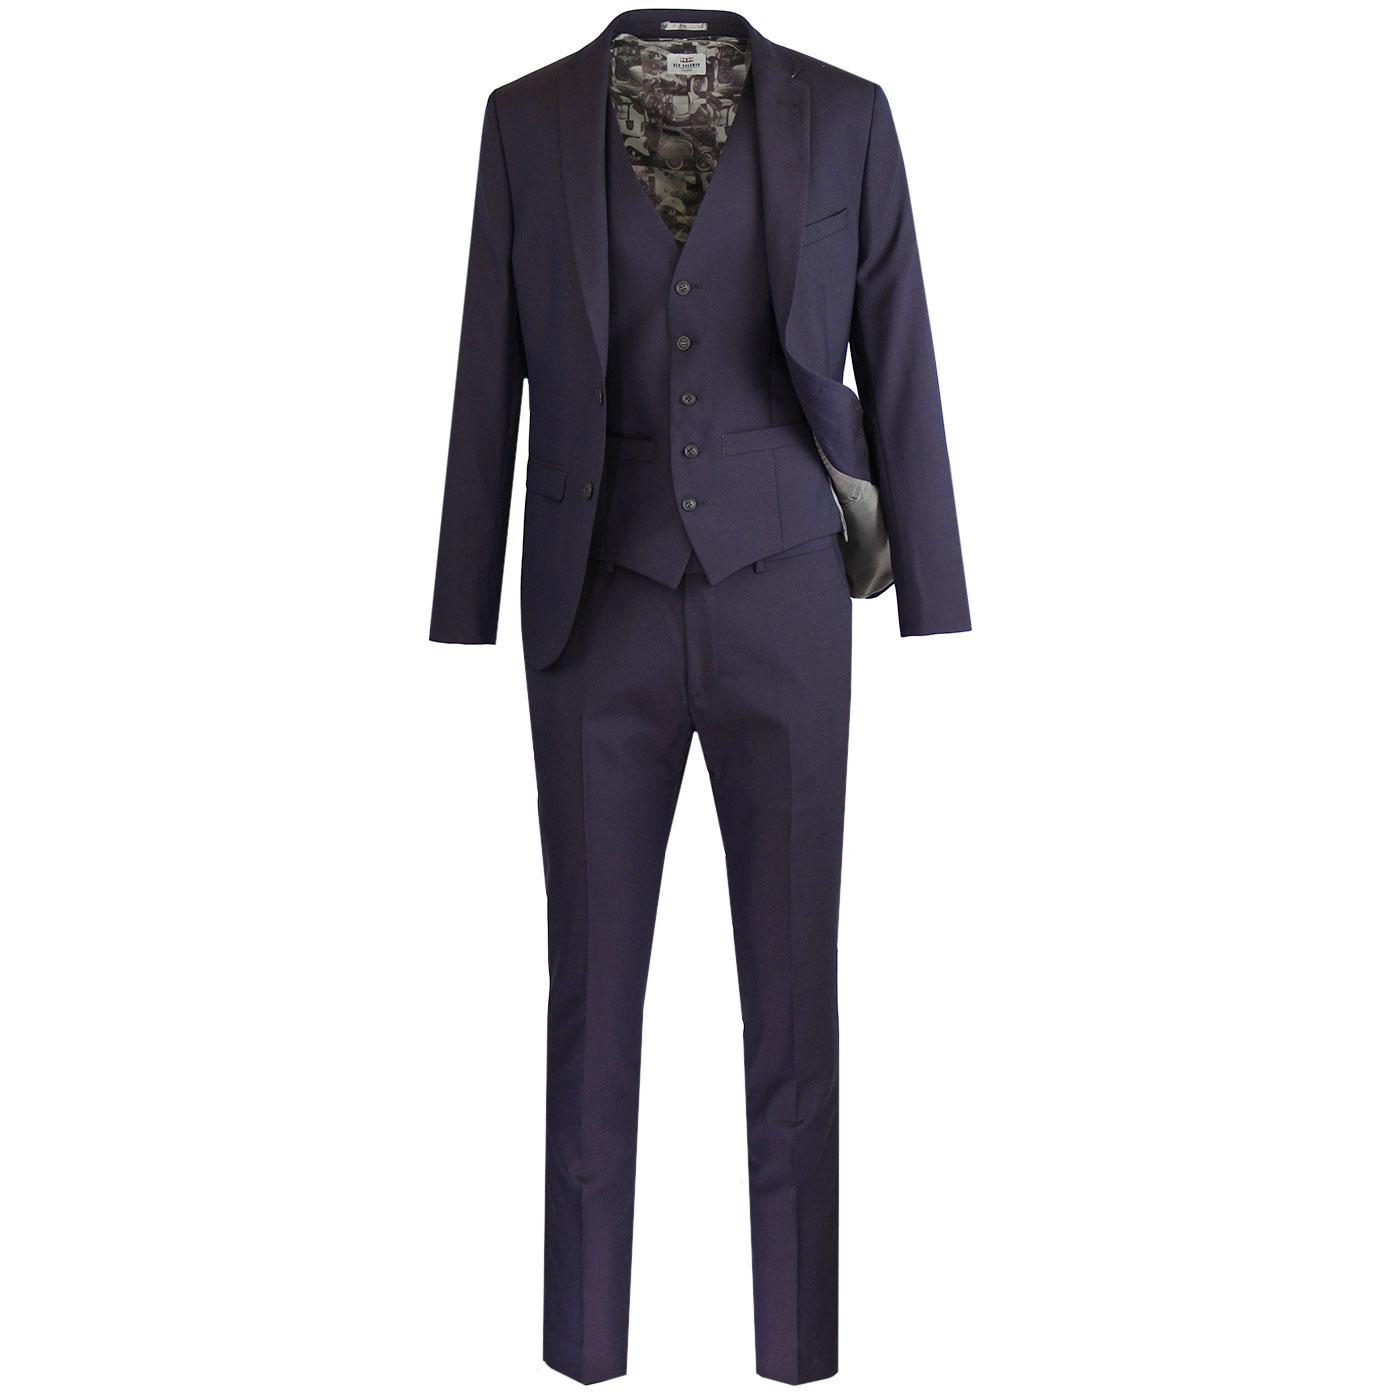 BEN SHERMAN Mod Tonic Scooter Suit in Aubergine